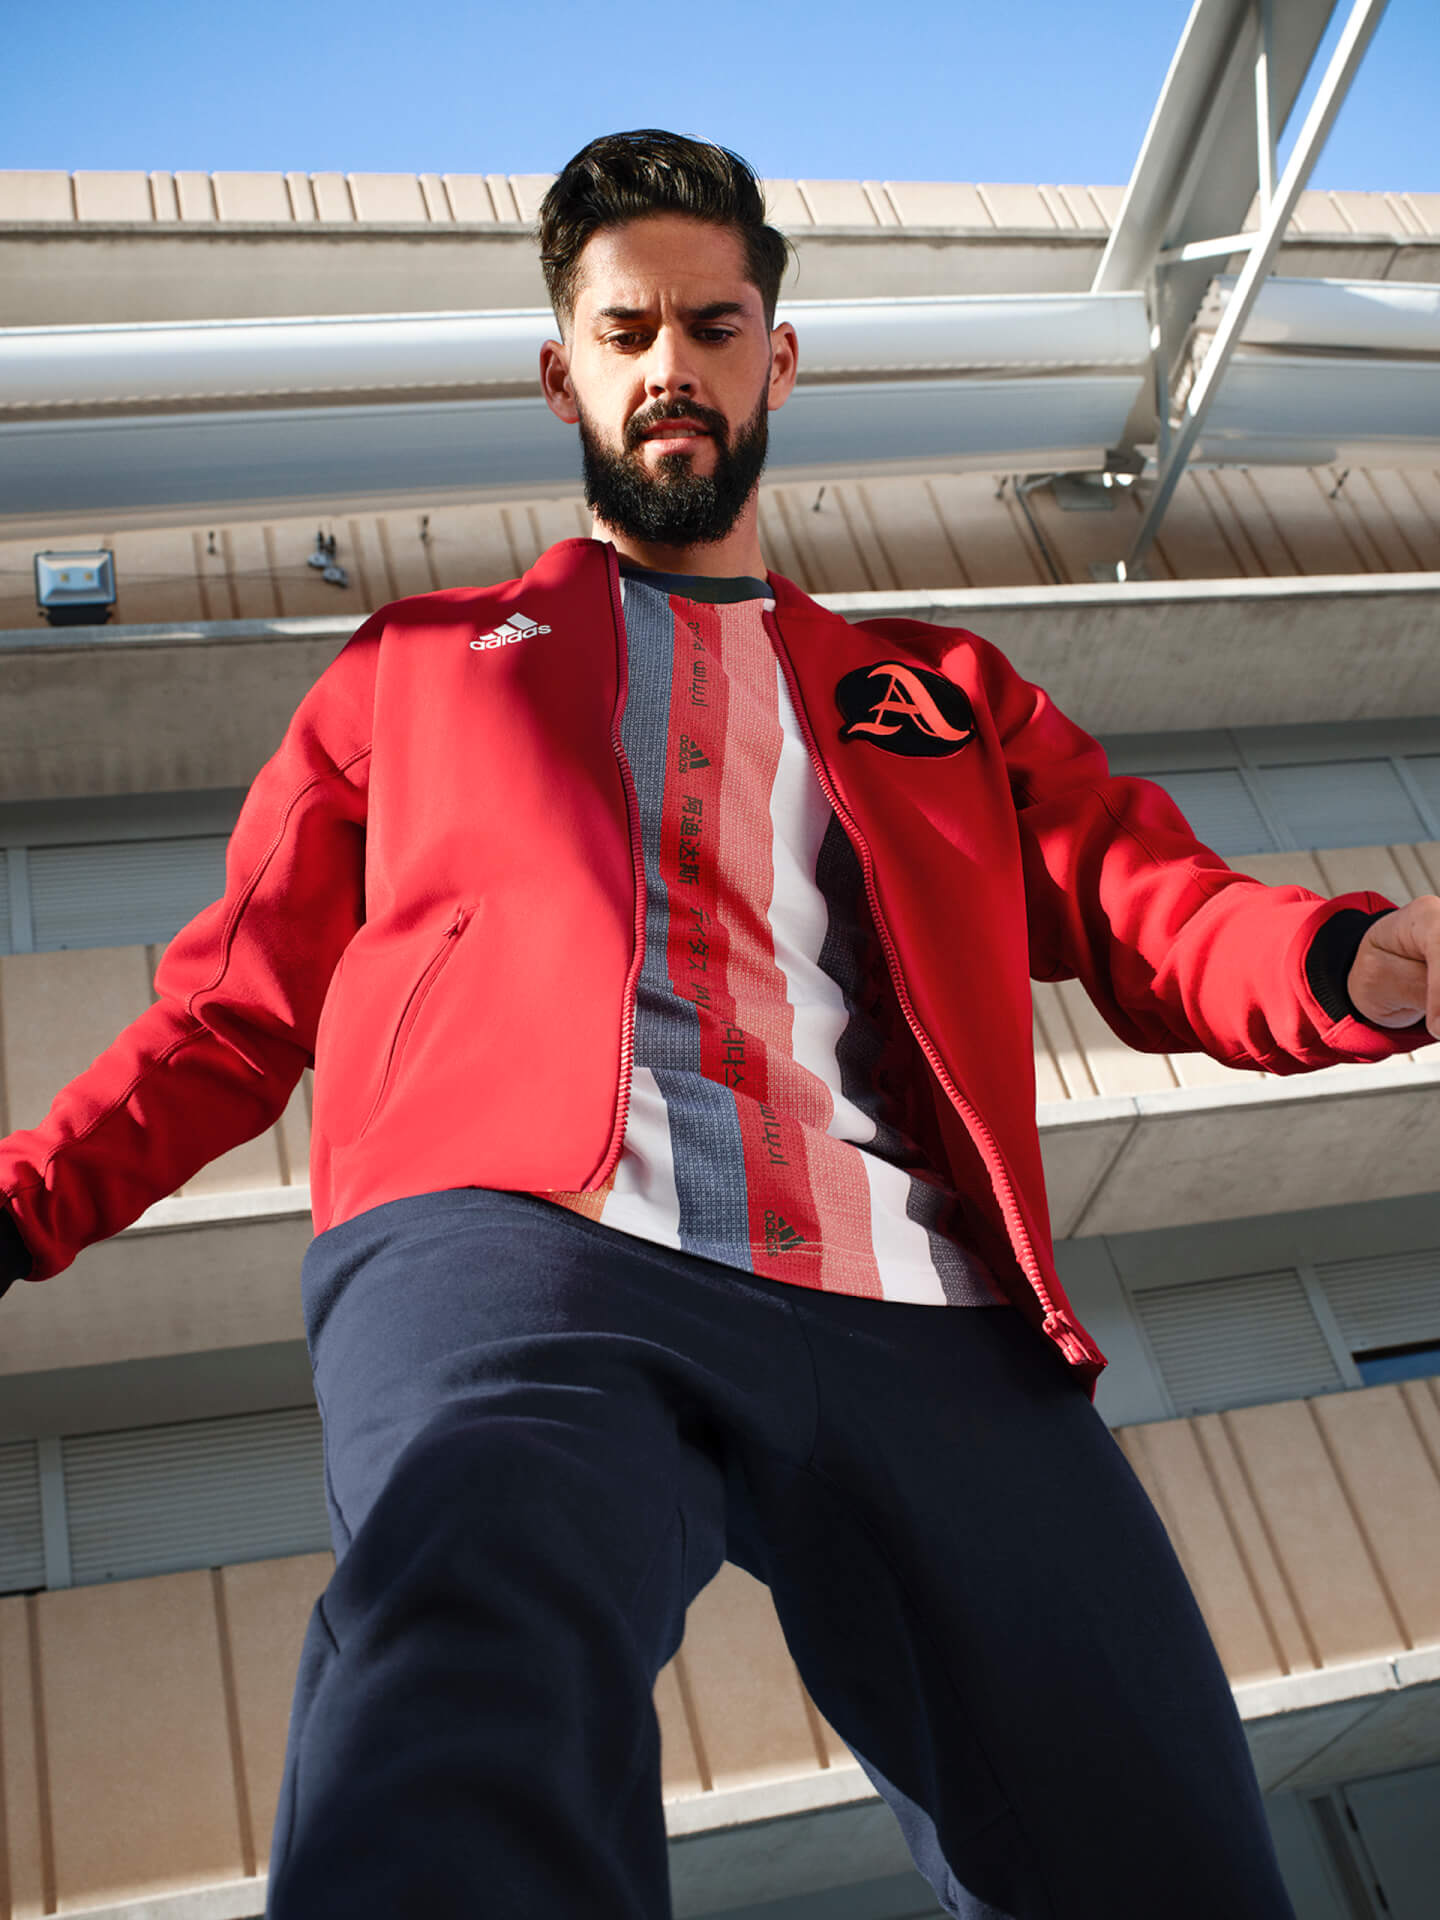 「adidas Athletics」SS20コレクションが発売!キャンペーンビジュアルを務めるコムアイのイメージフィルム本日公開 lf200206_addidasathletics_17